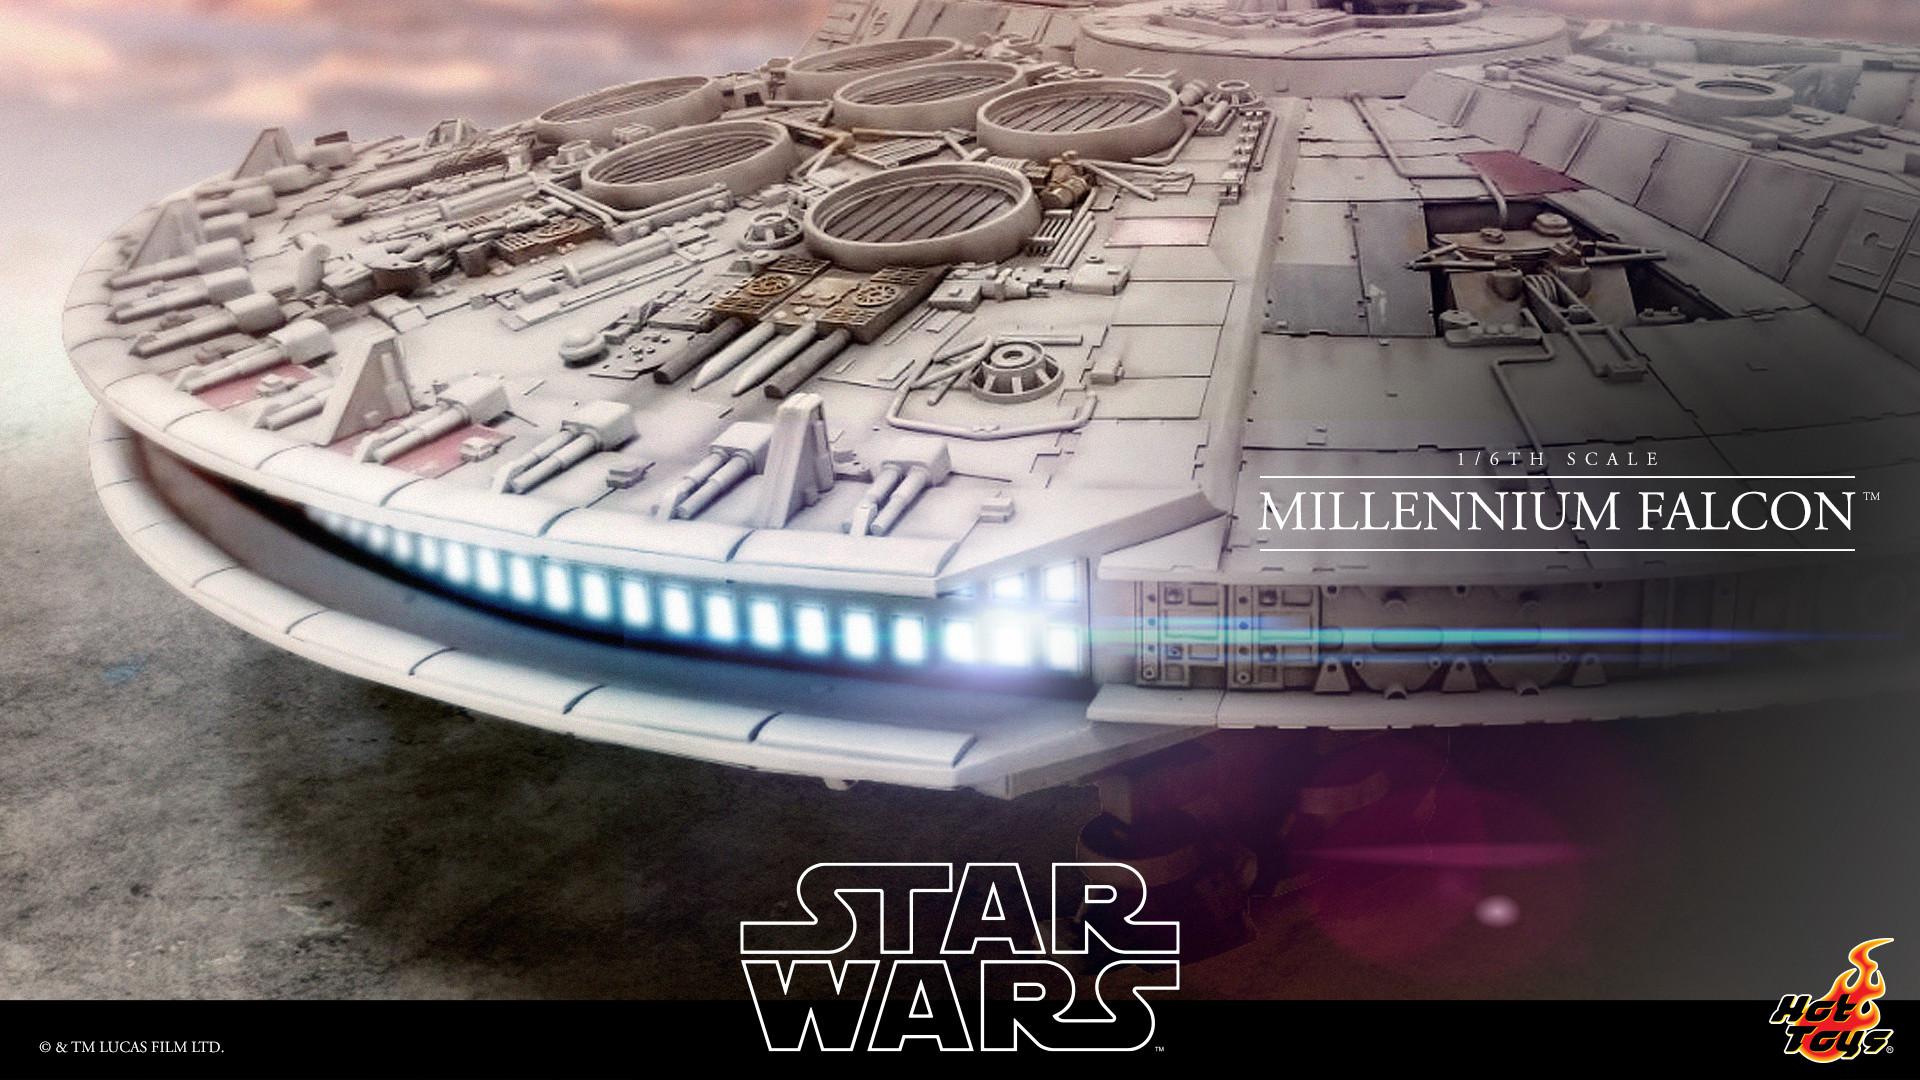 hot-toys-millennium-falcon-image-18-foot-long-